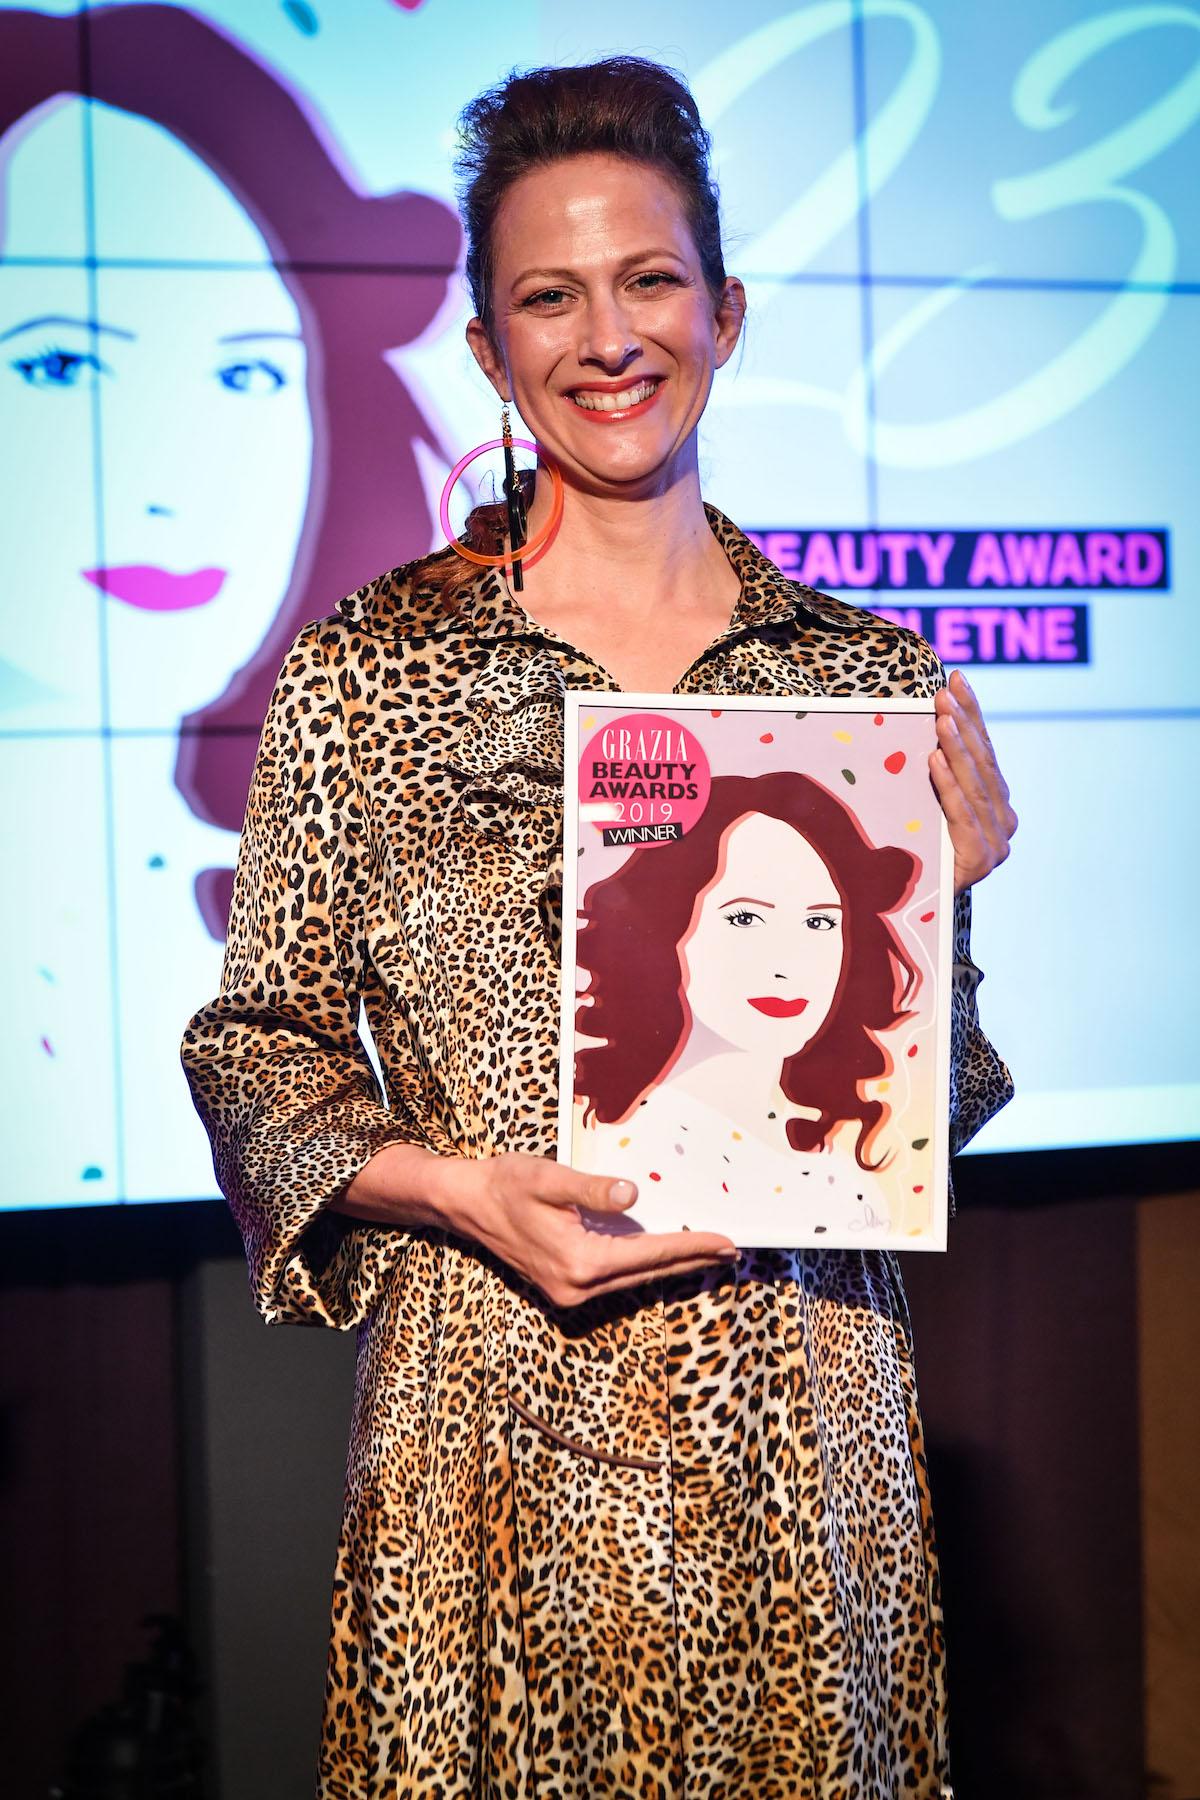 Grazia_Awards_2019__beautyfull blog 010